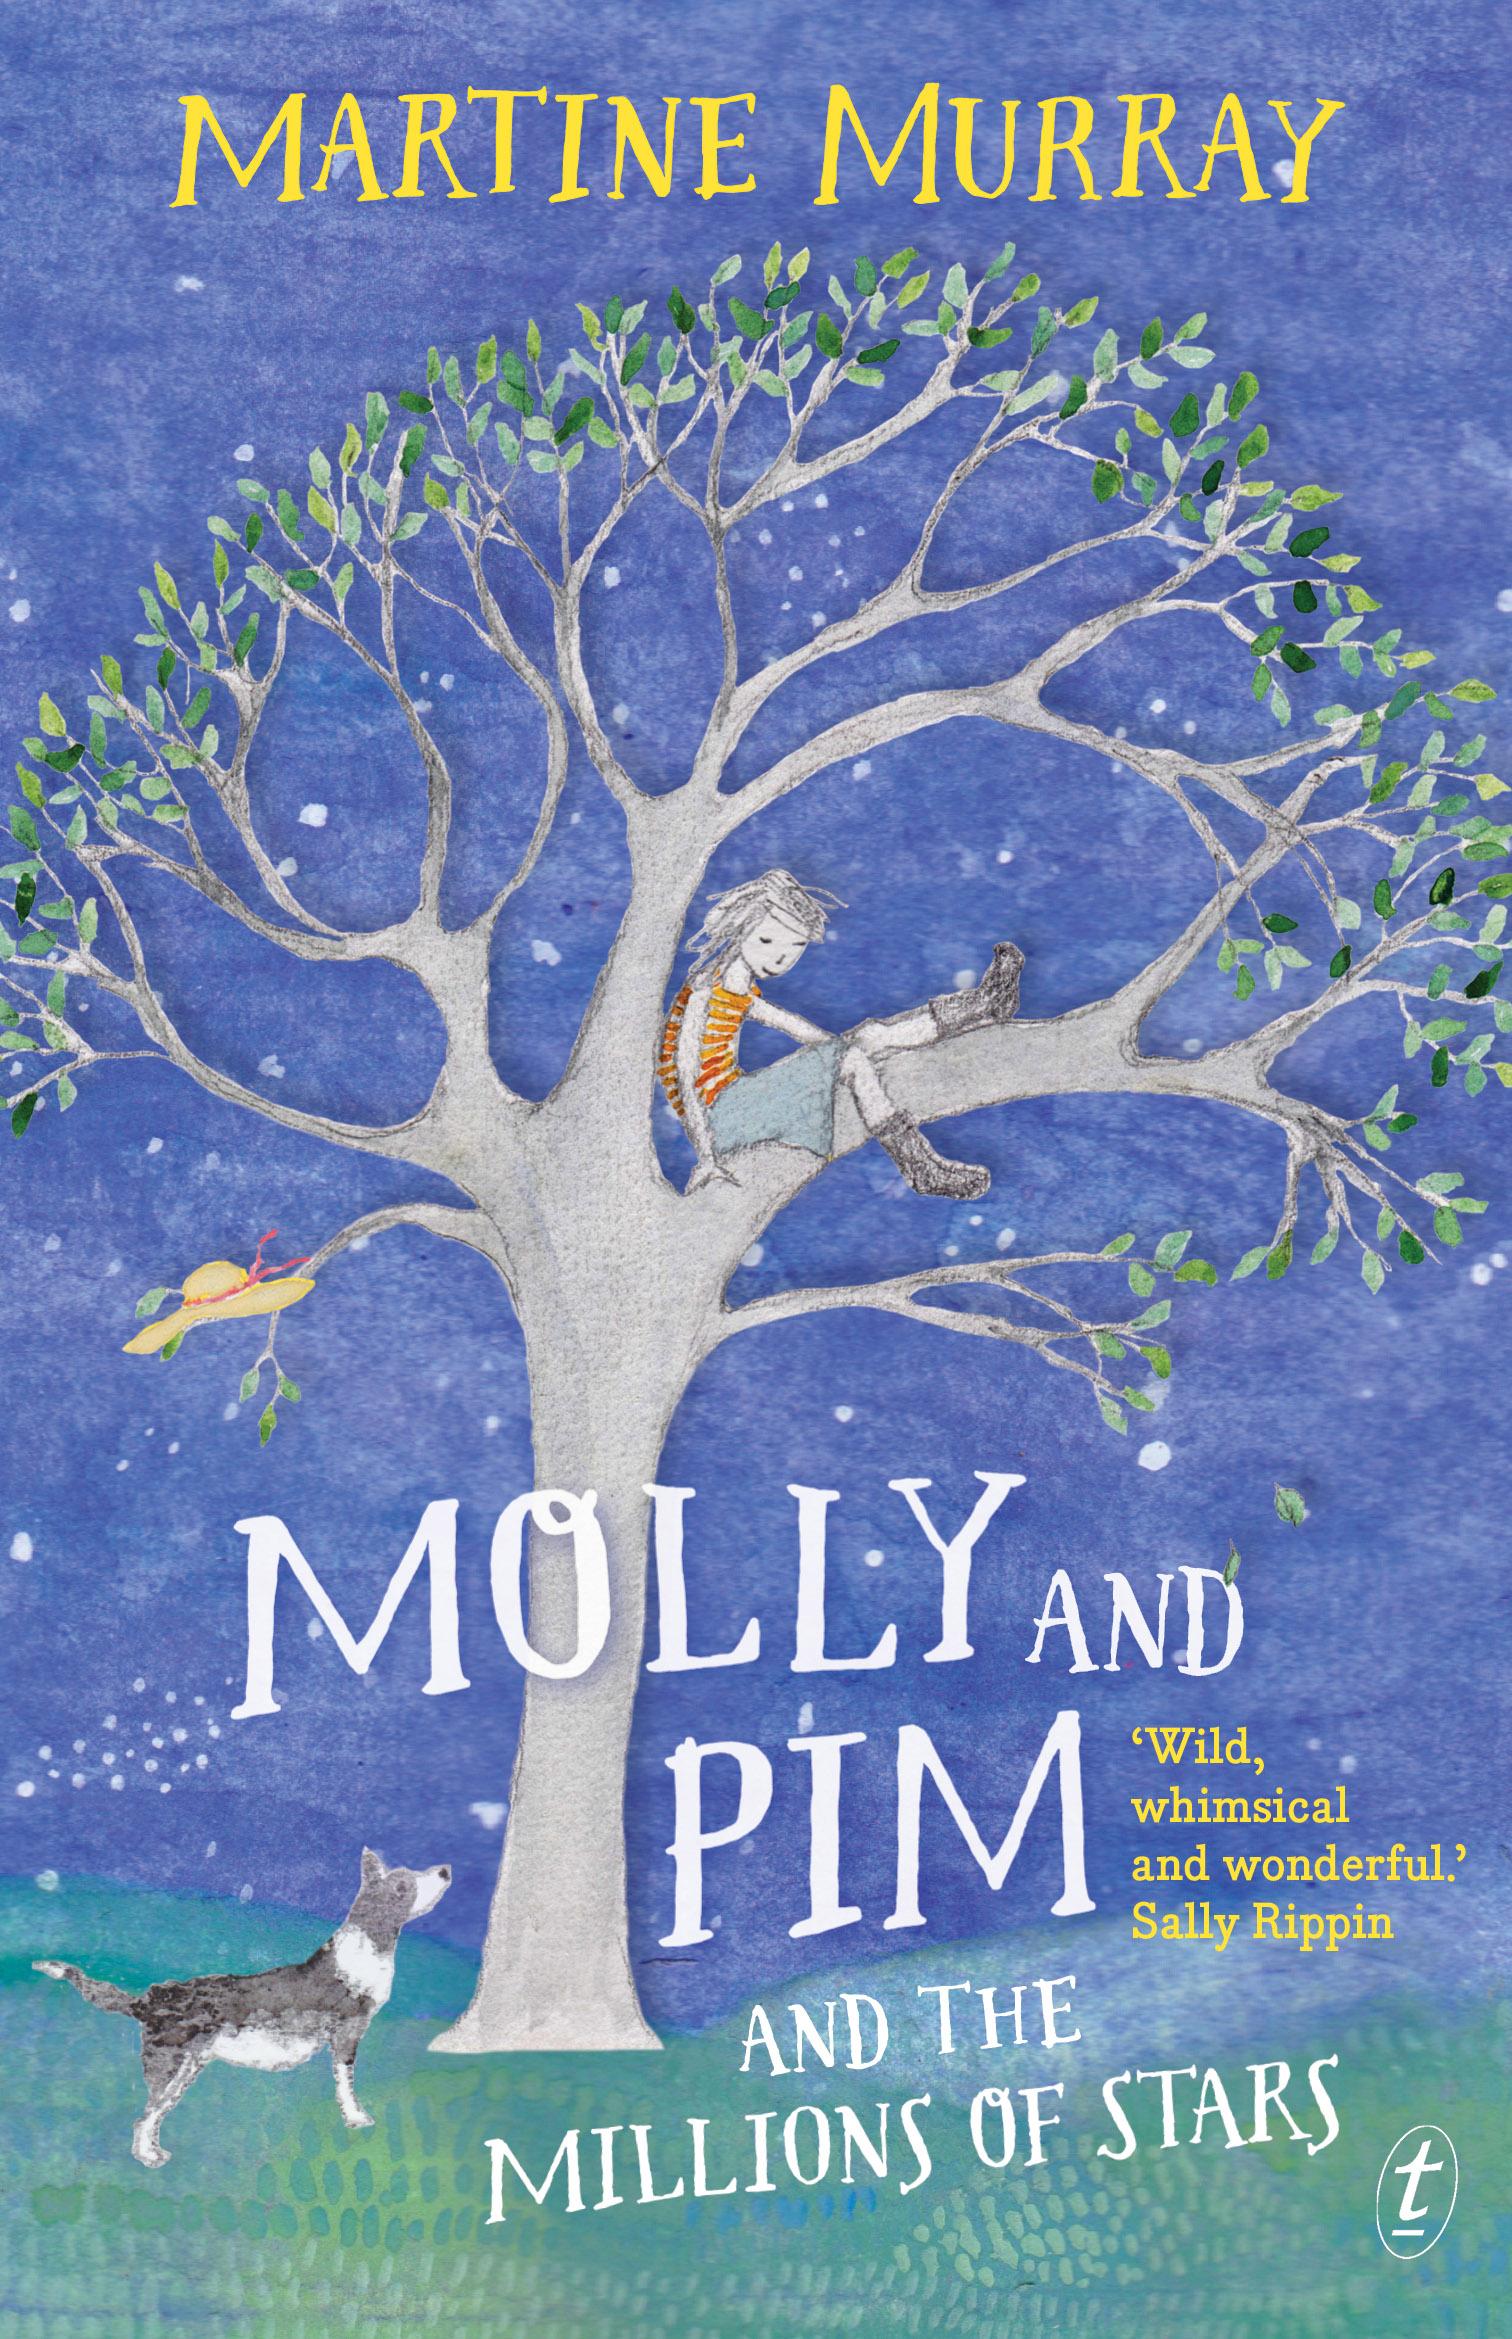 Molly-and-Pim.jpg